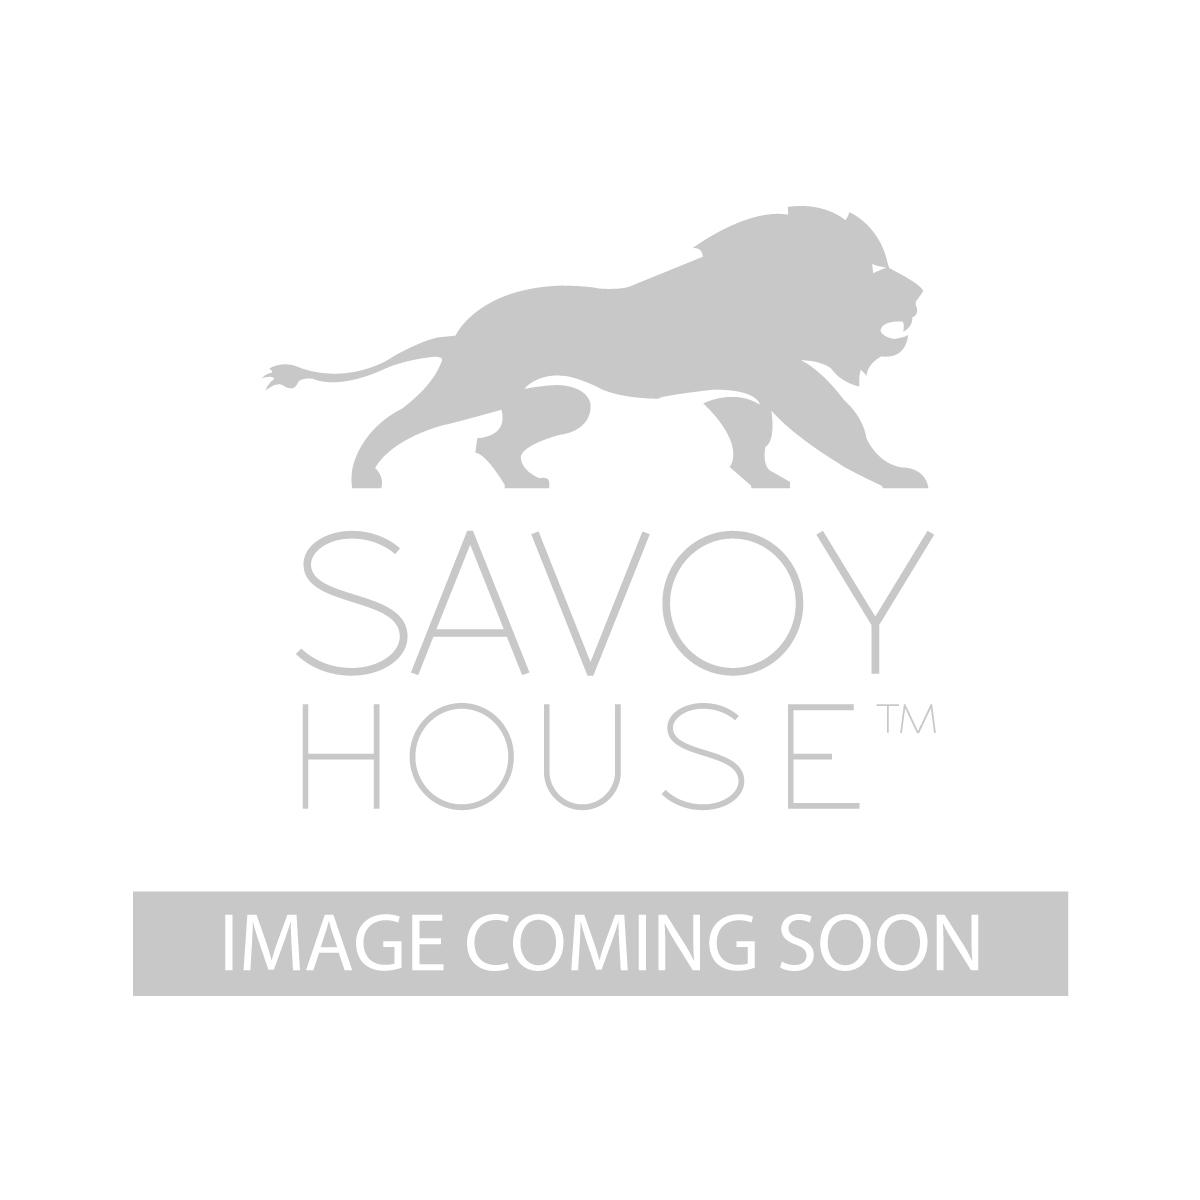 7 5013 1 84 sommerton 1 light pendant by savoy house for Www savoyhouse com